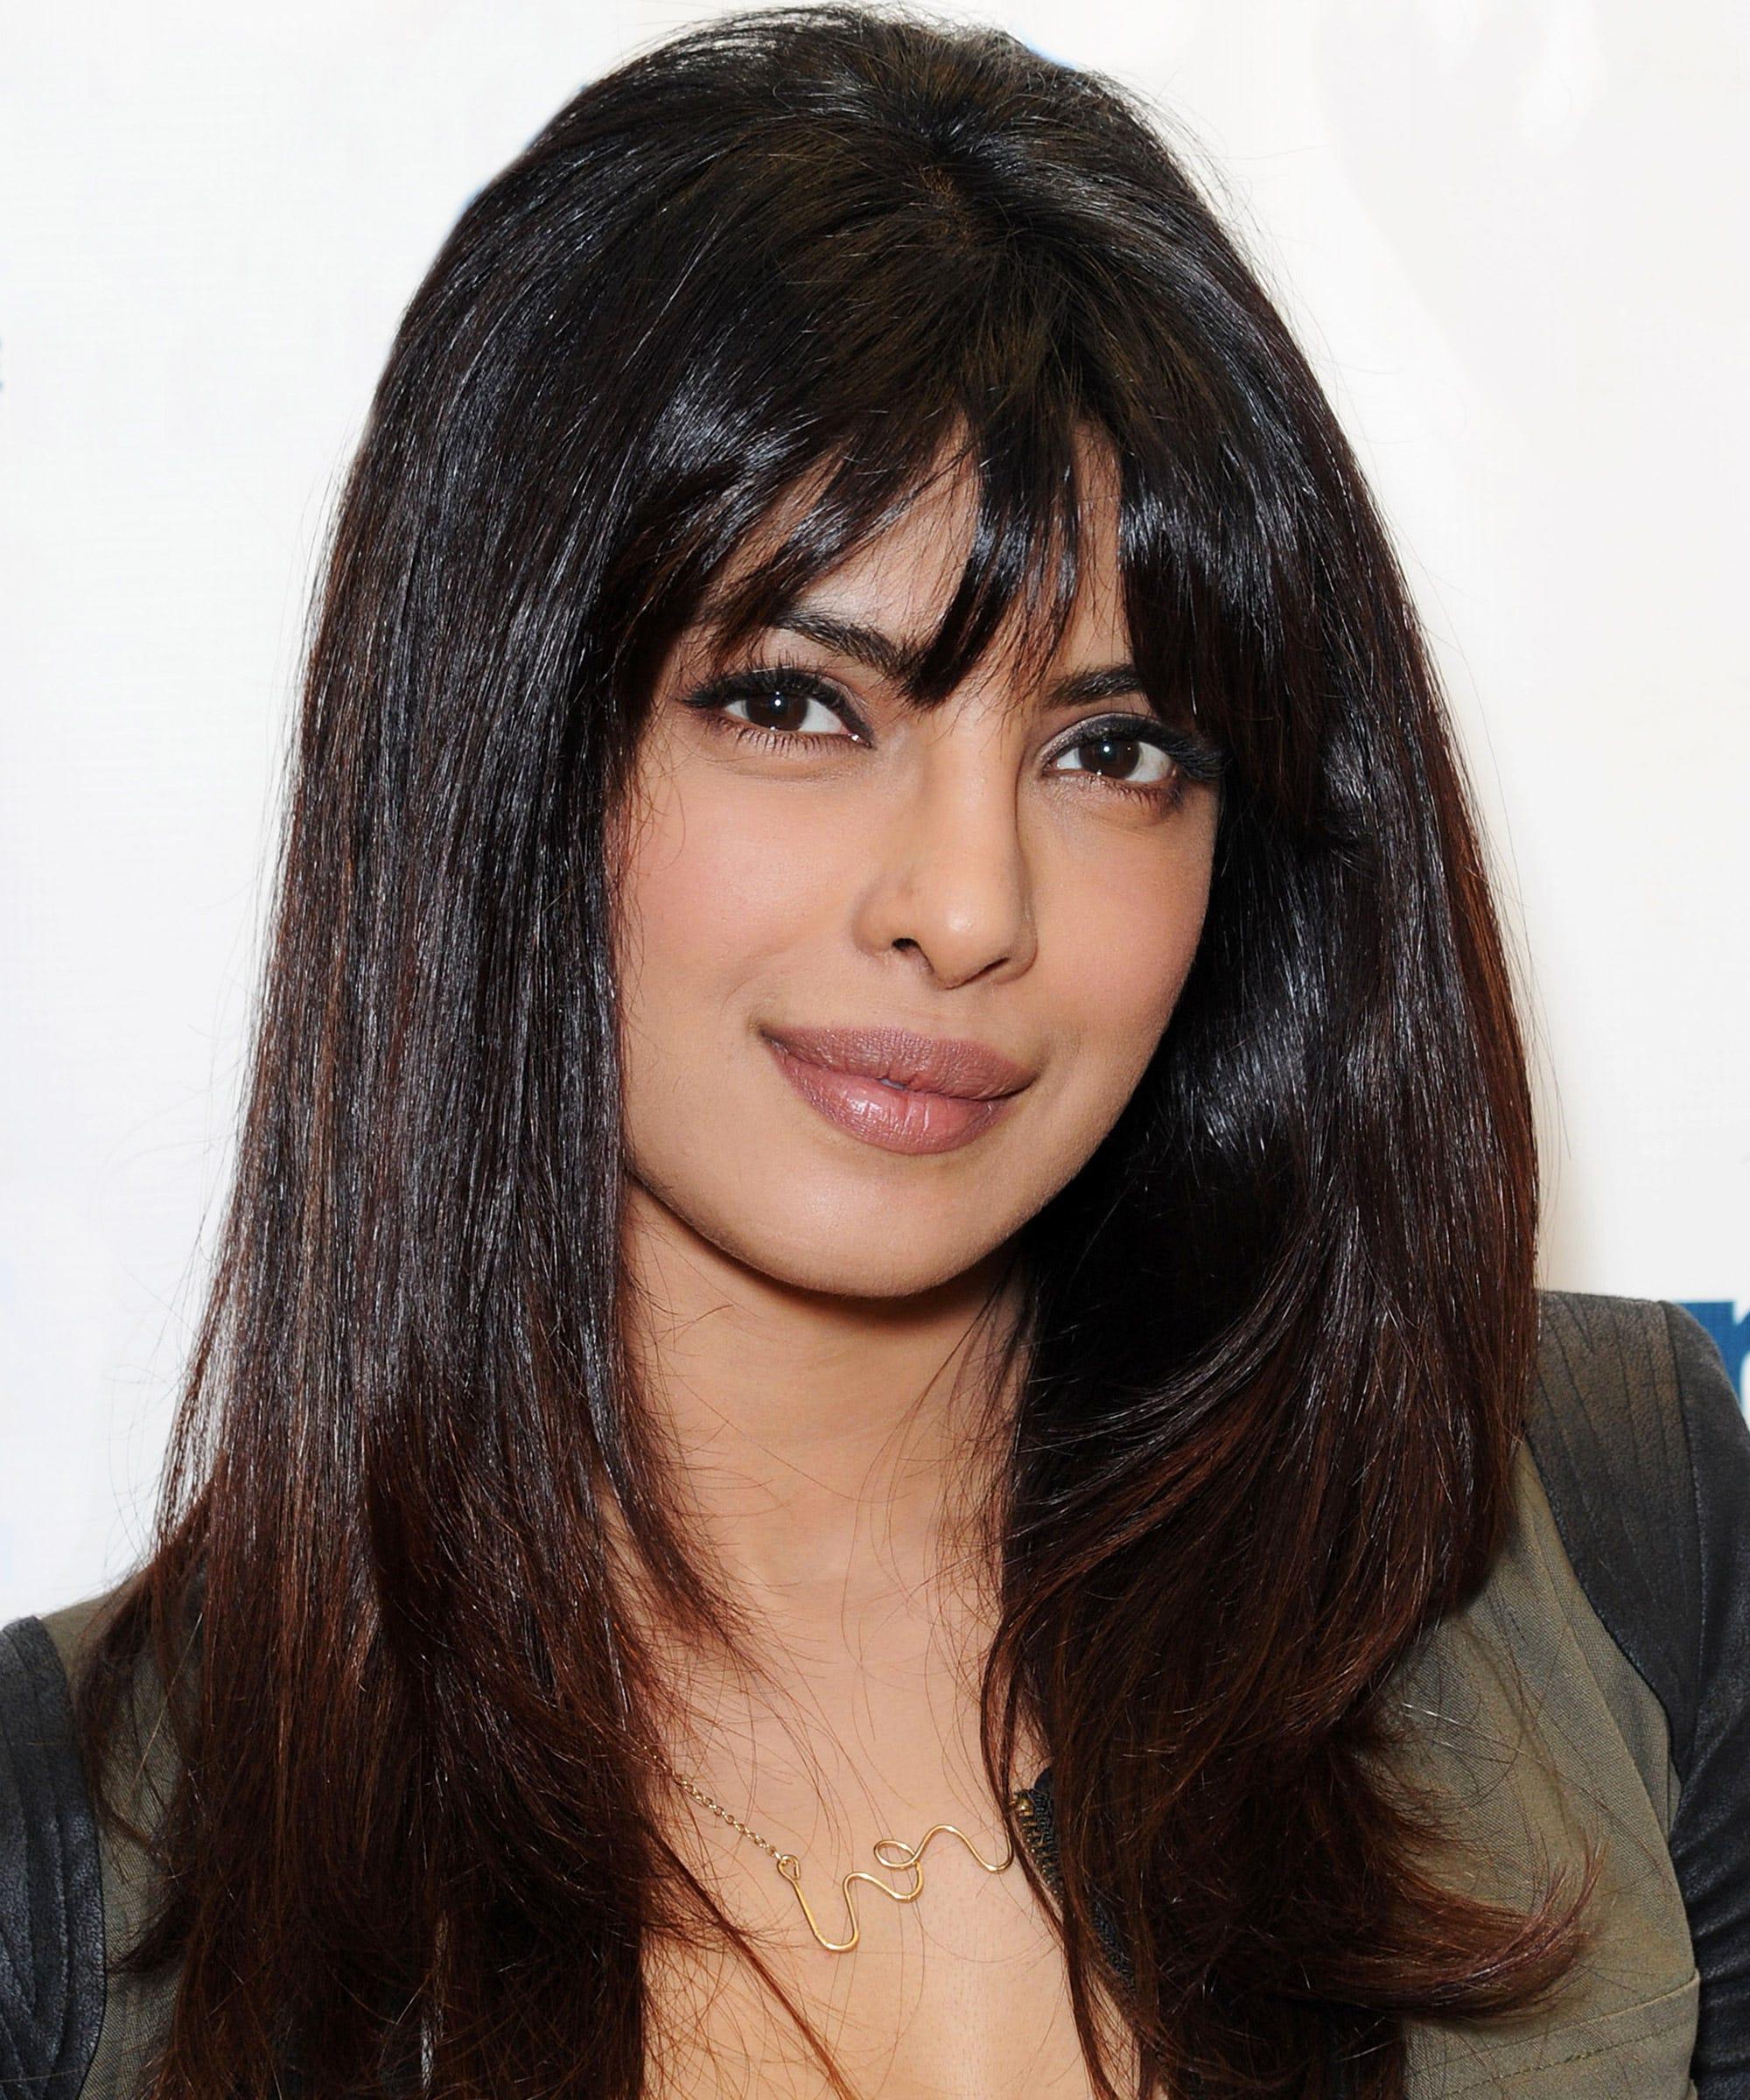 Priyanka Chopra Haircut In Dostana What Hairstyle Is Best For Me